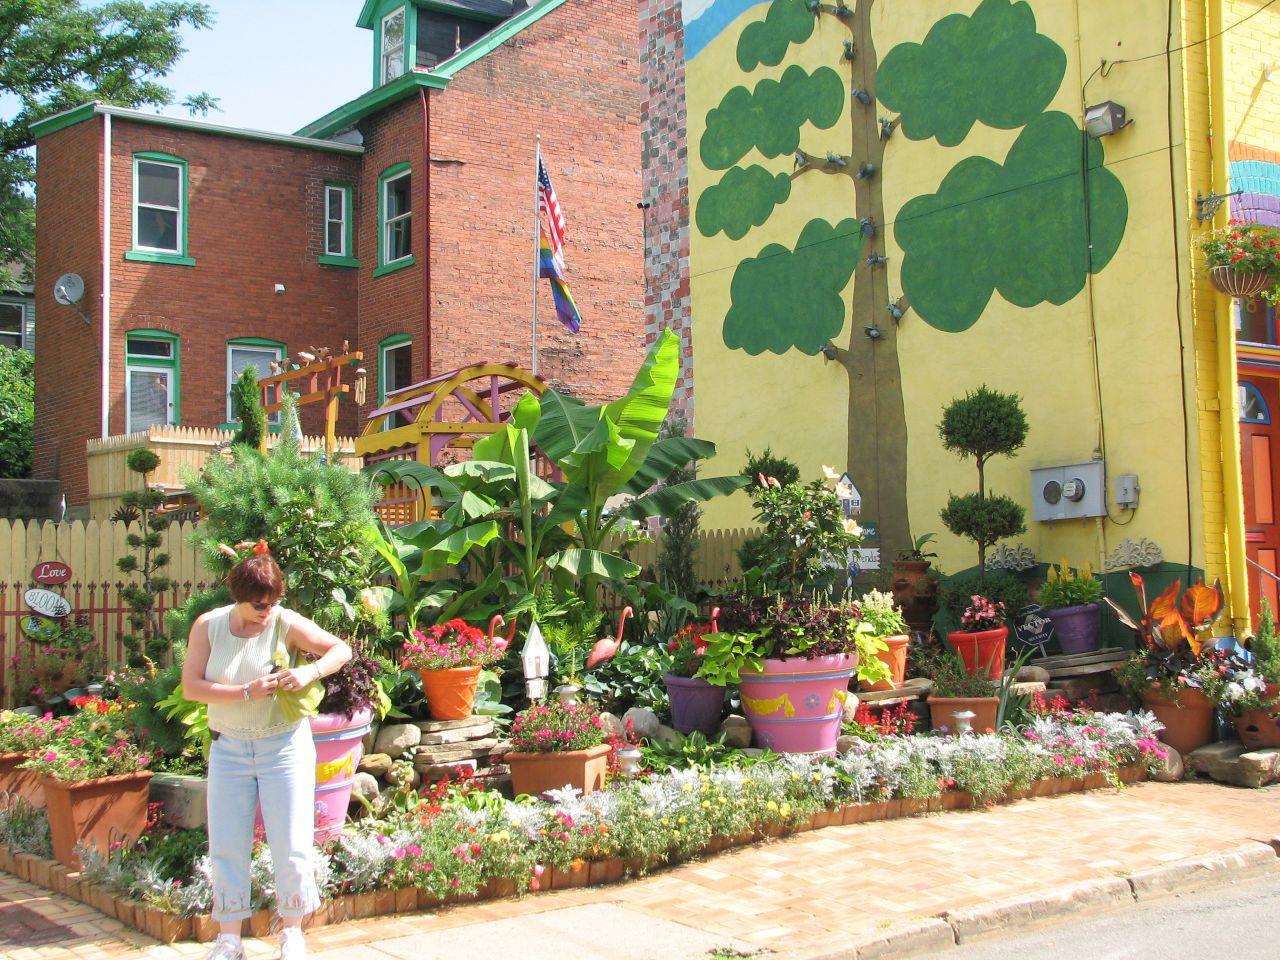 Rainbow Garden Designs For Kids - How To Make A Rainbow Garden